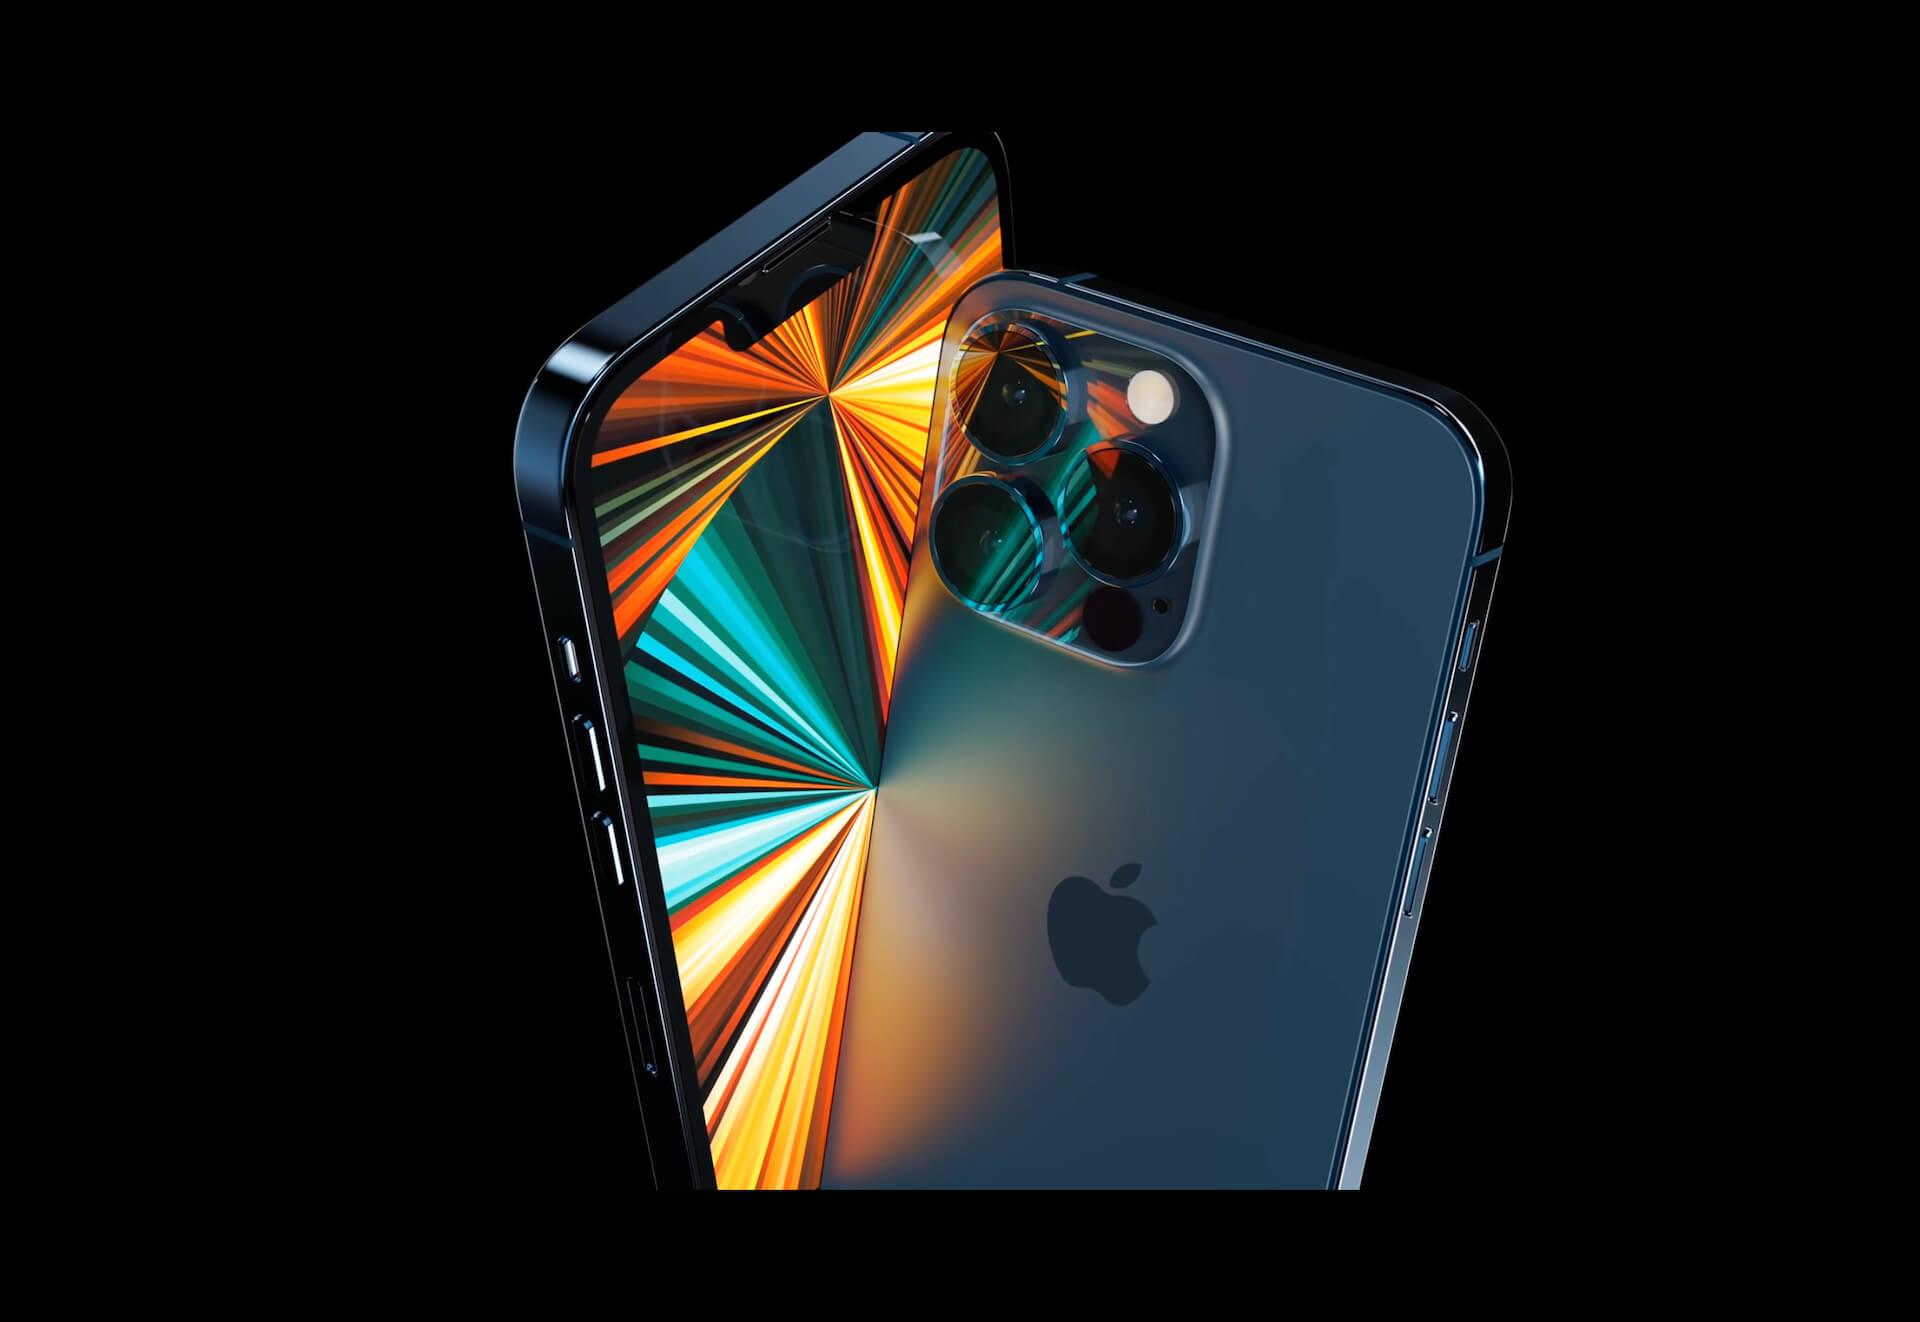 iPhone 13シリーズはApple Watch同様、常時表示ディスプレイが搭載か? tech210719_iphone13_main